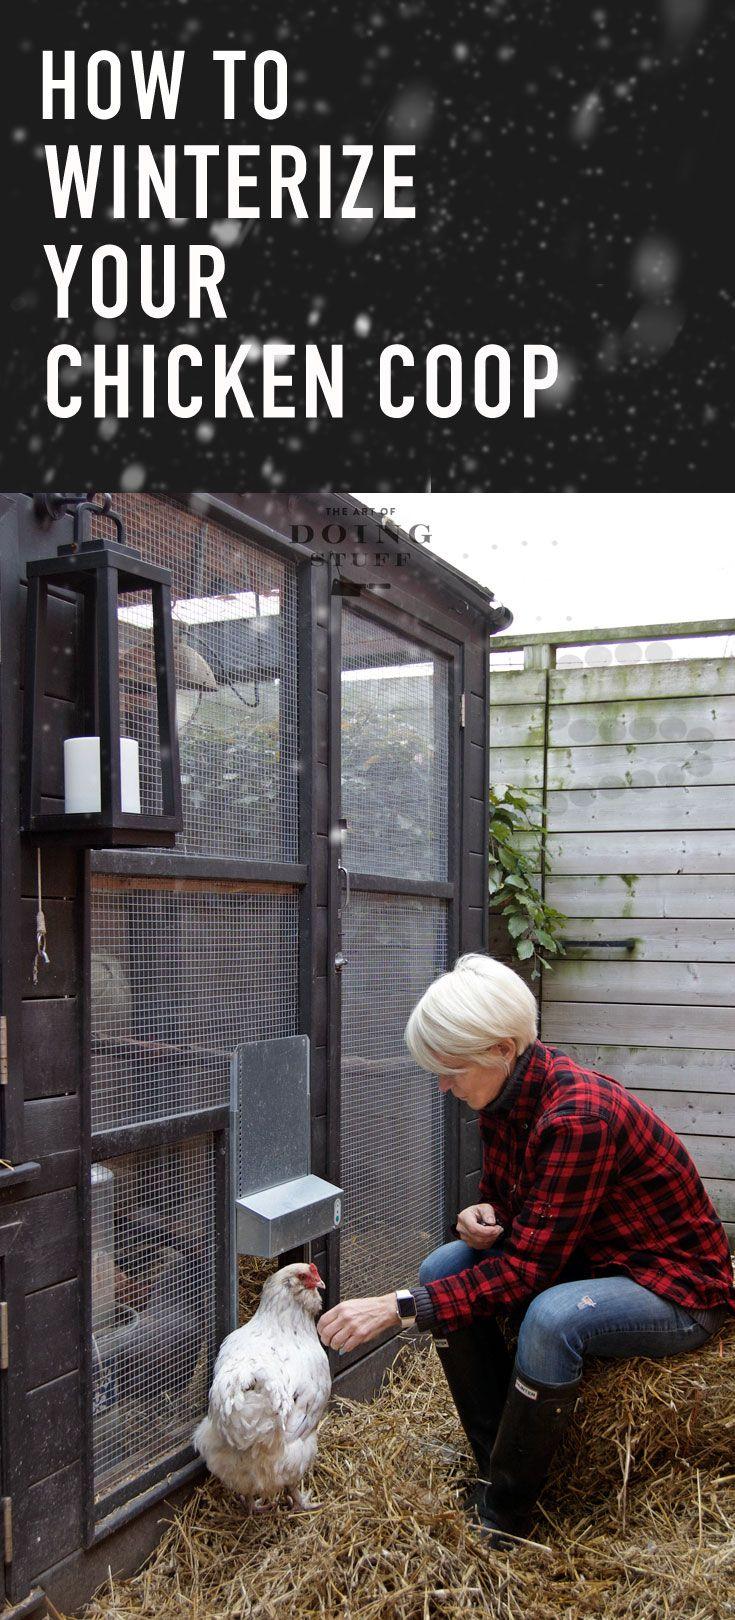 Winterize a chicken coop